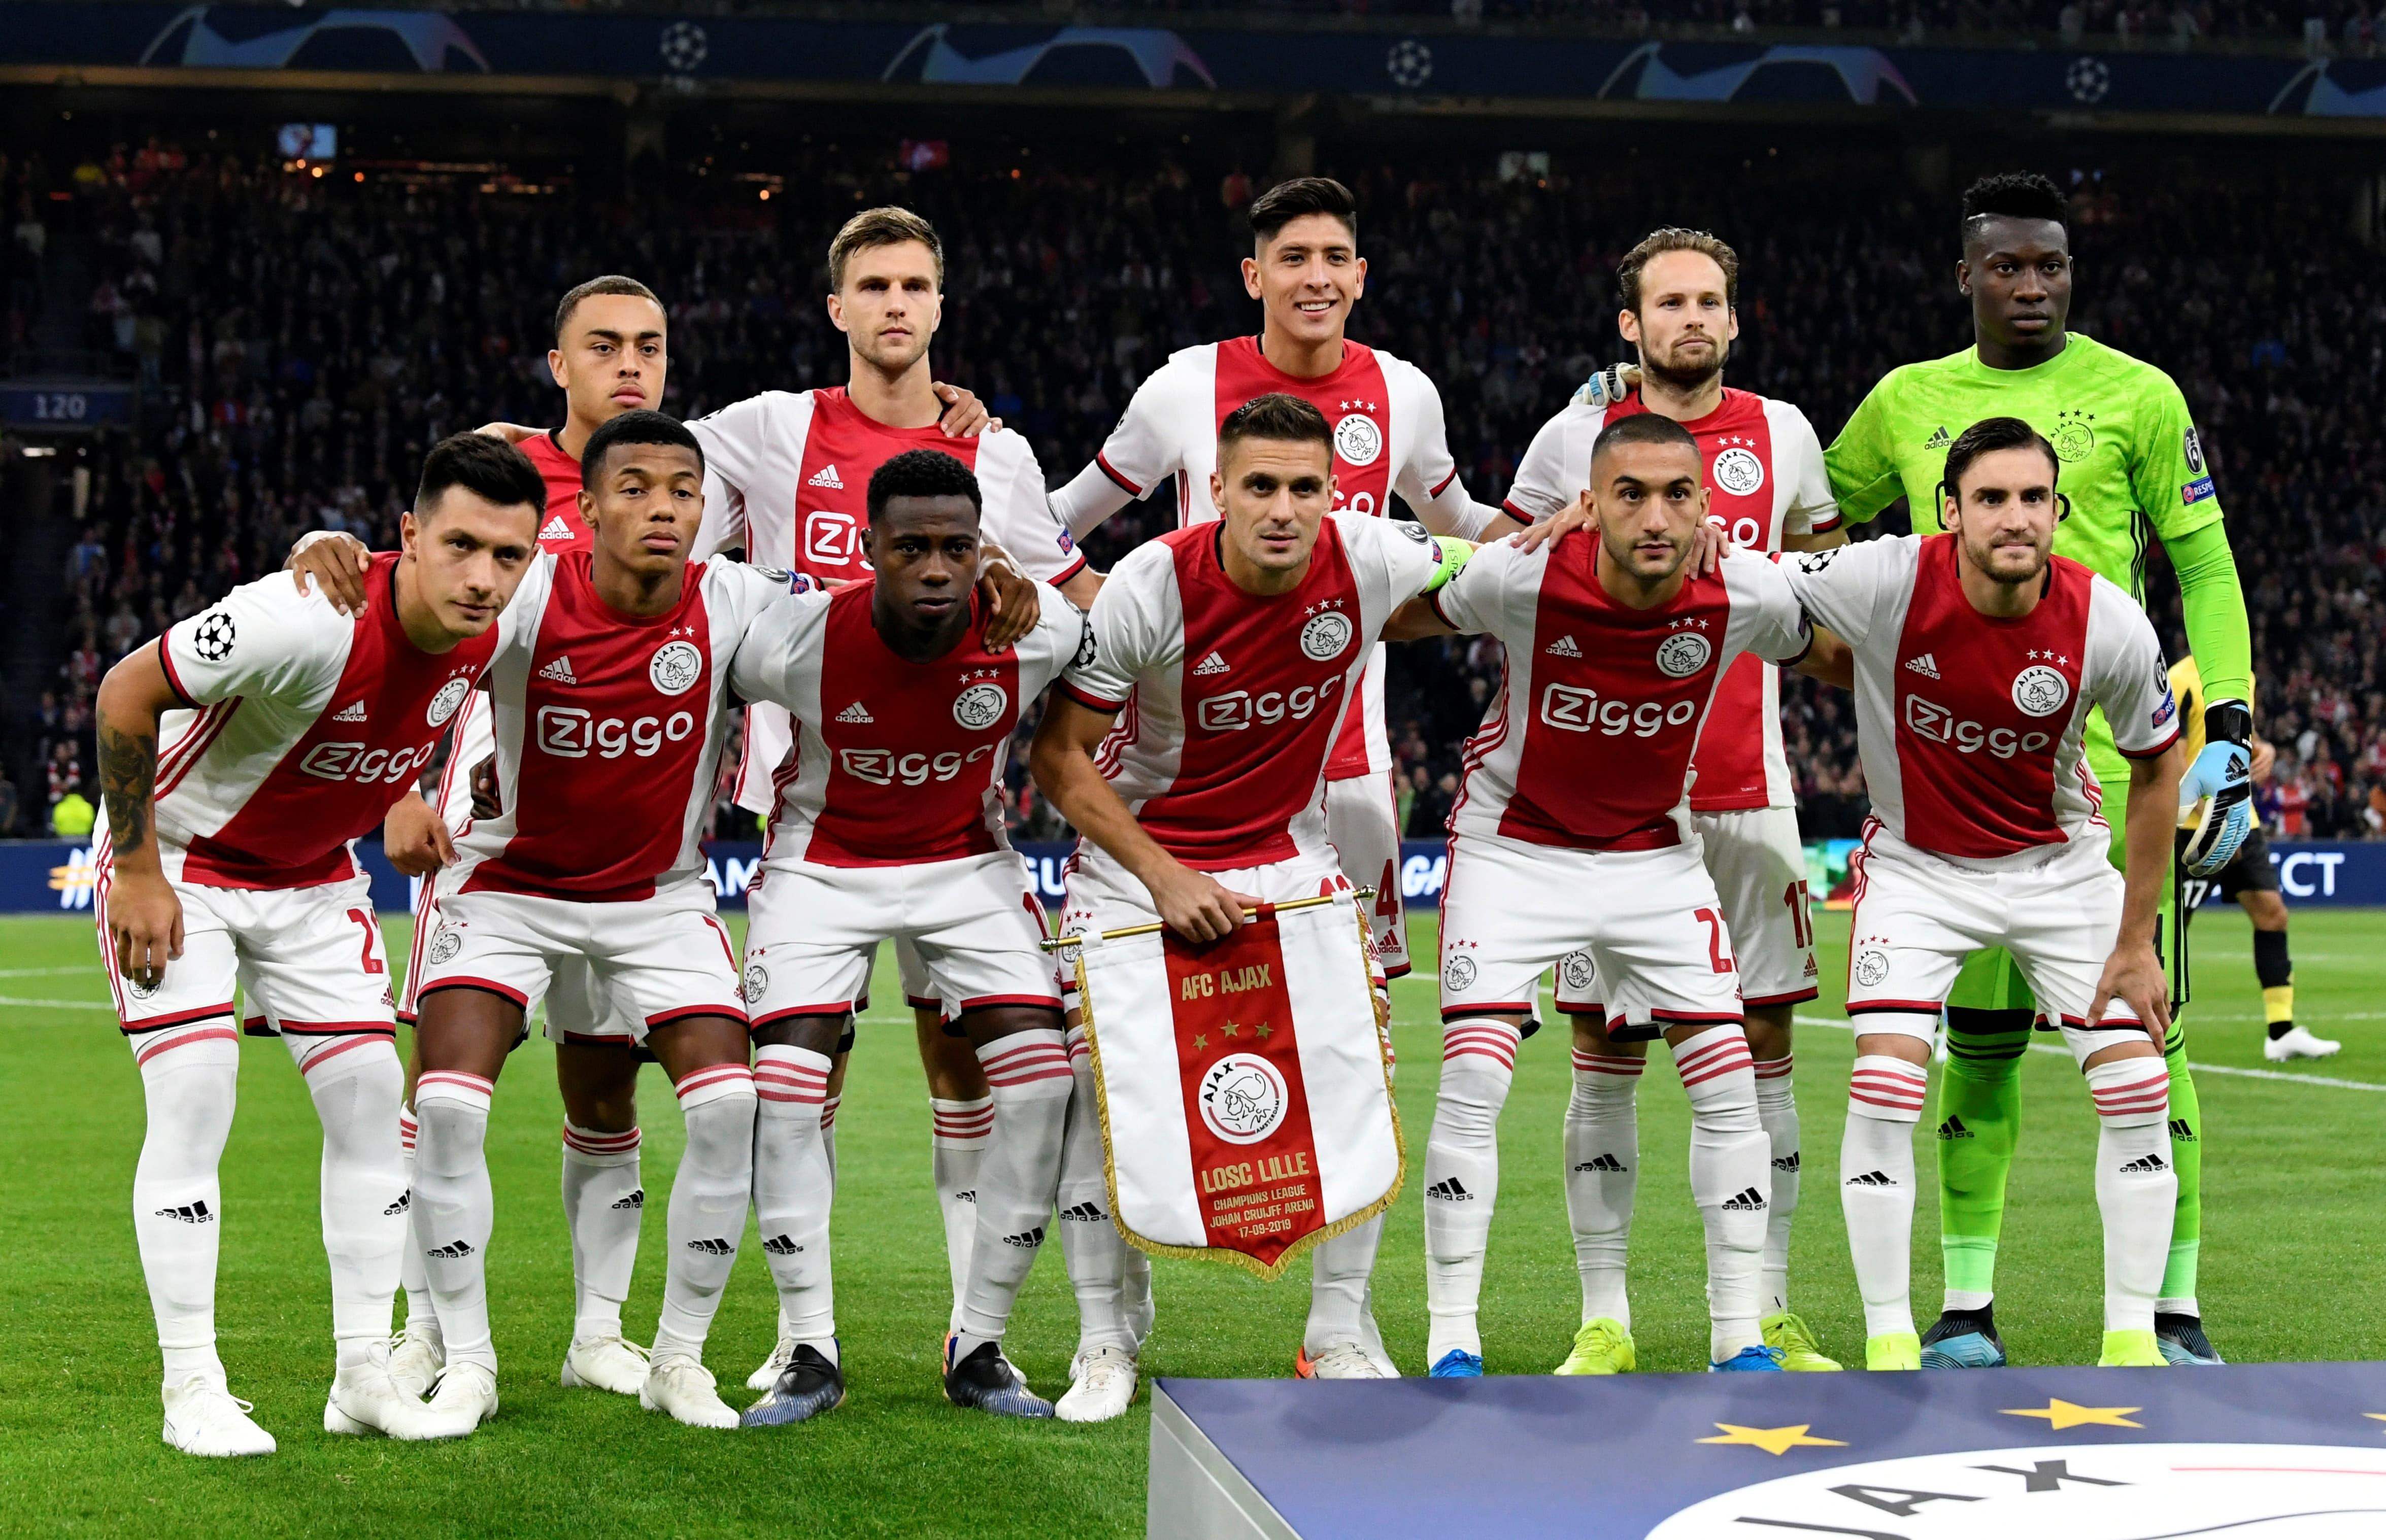 AFC Ajax Players Salaries 2019/20 (Weekly Wages)